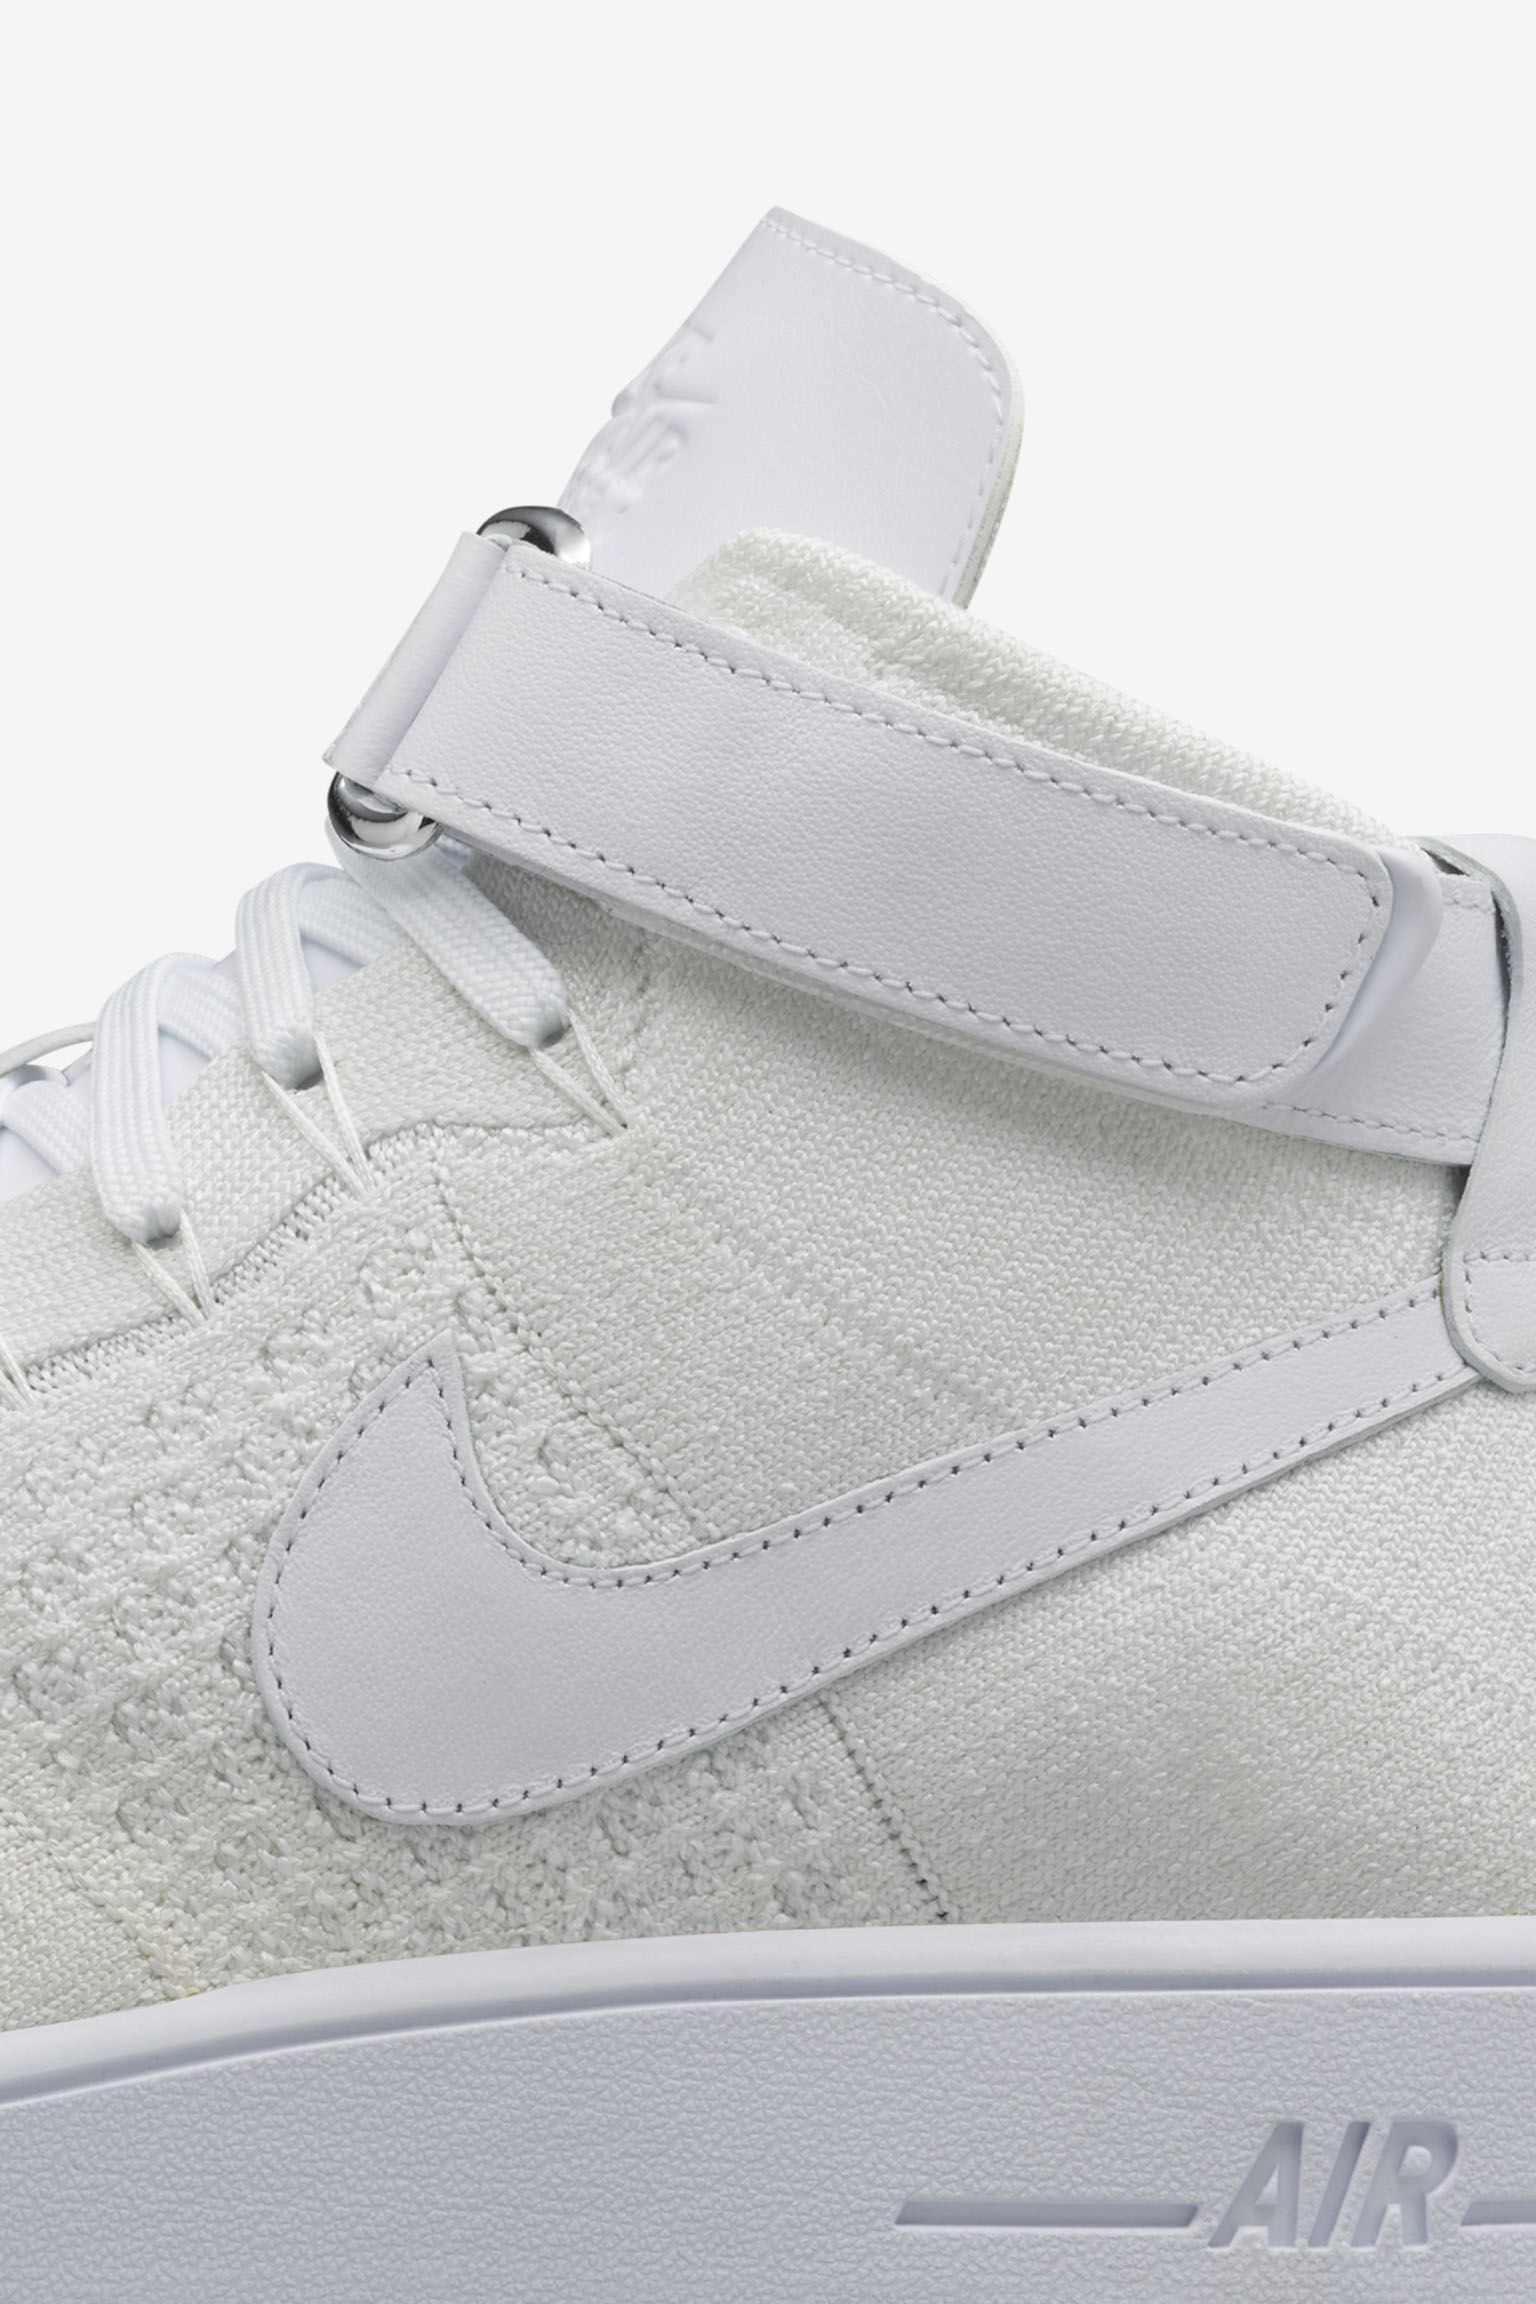 Nike Air Force 1 Ultra Flyknit Mid 'Triple White' Release Date